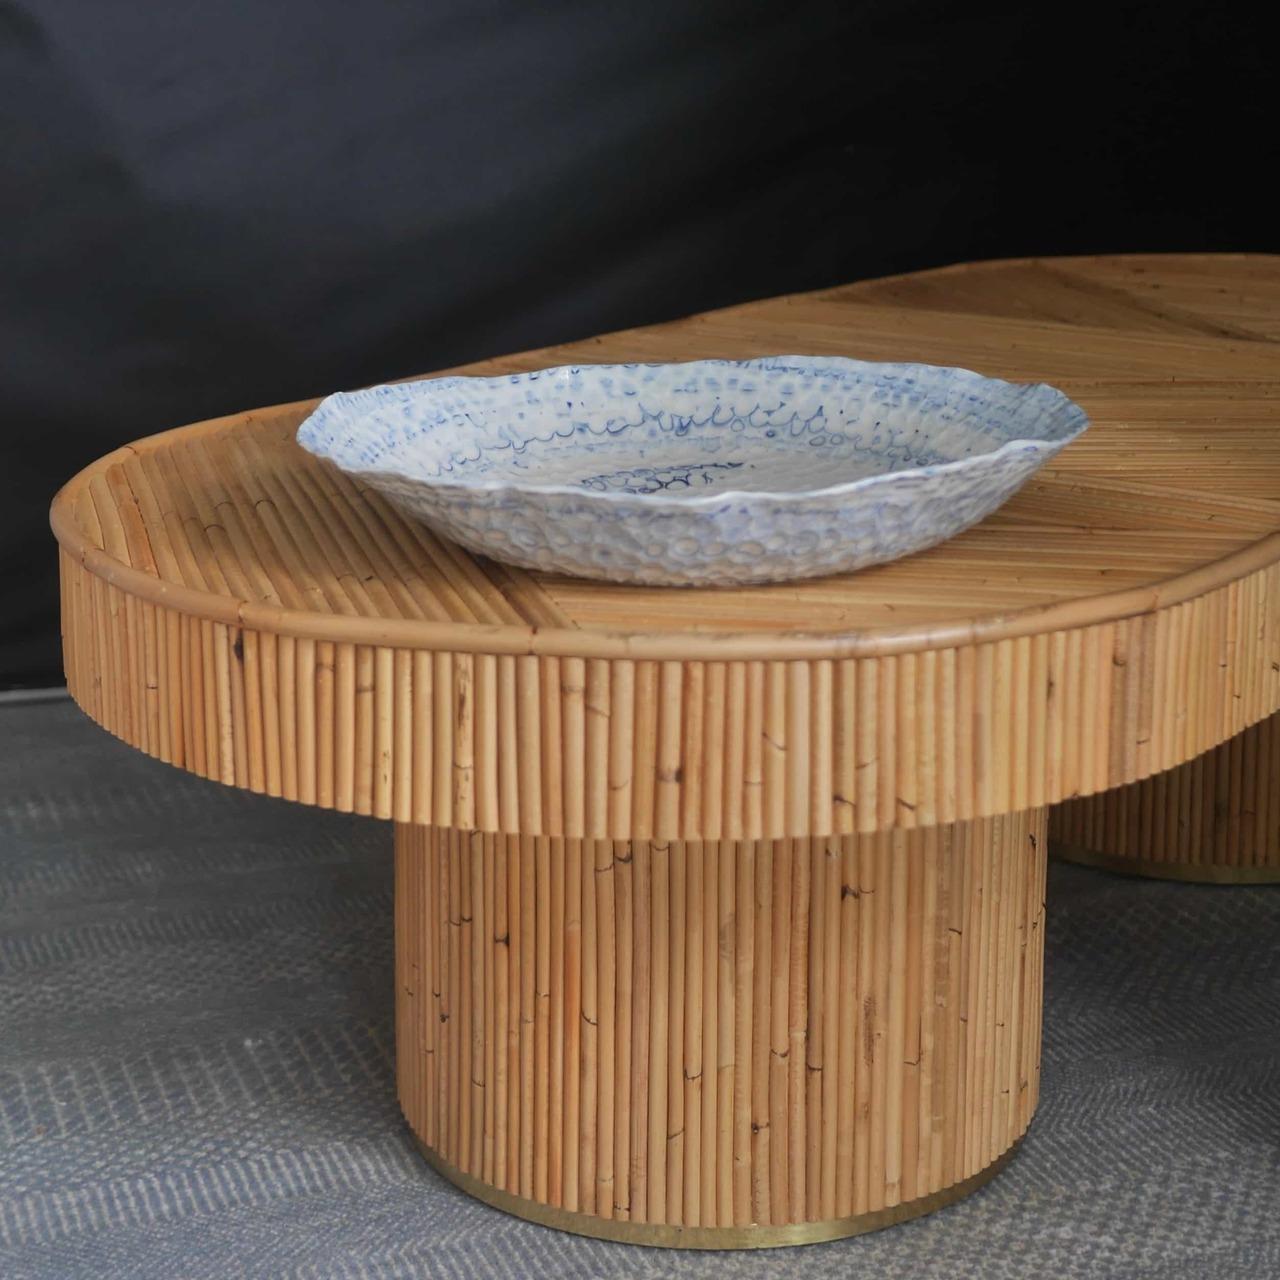 CapKaroso-loungetable-ceramicplate